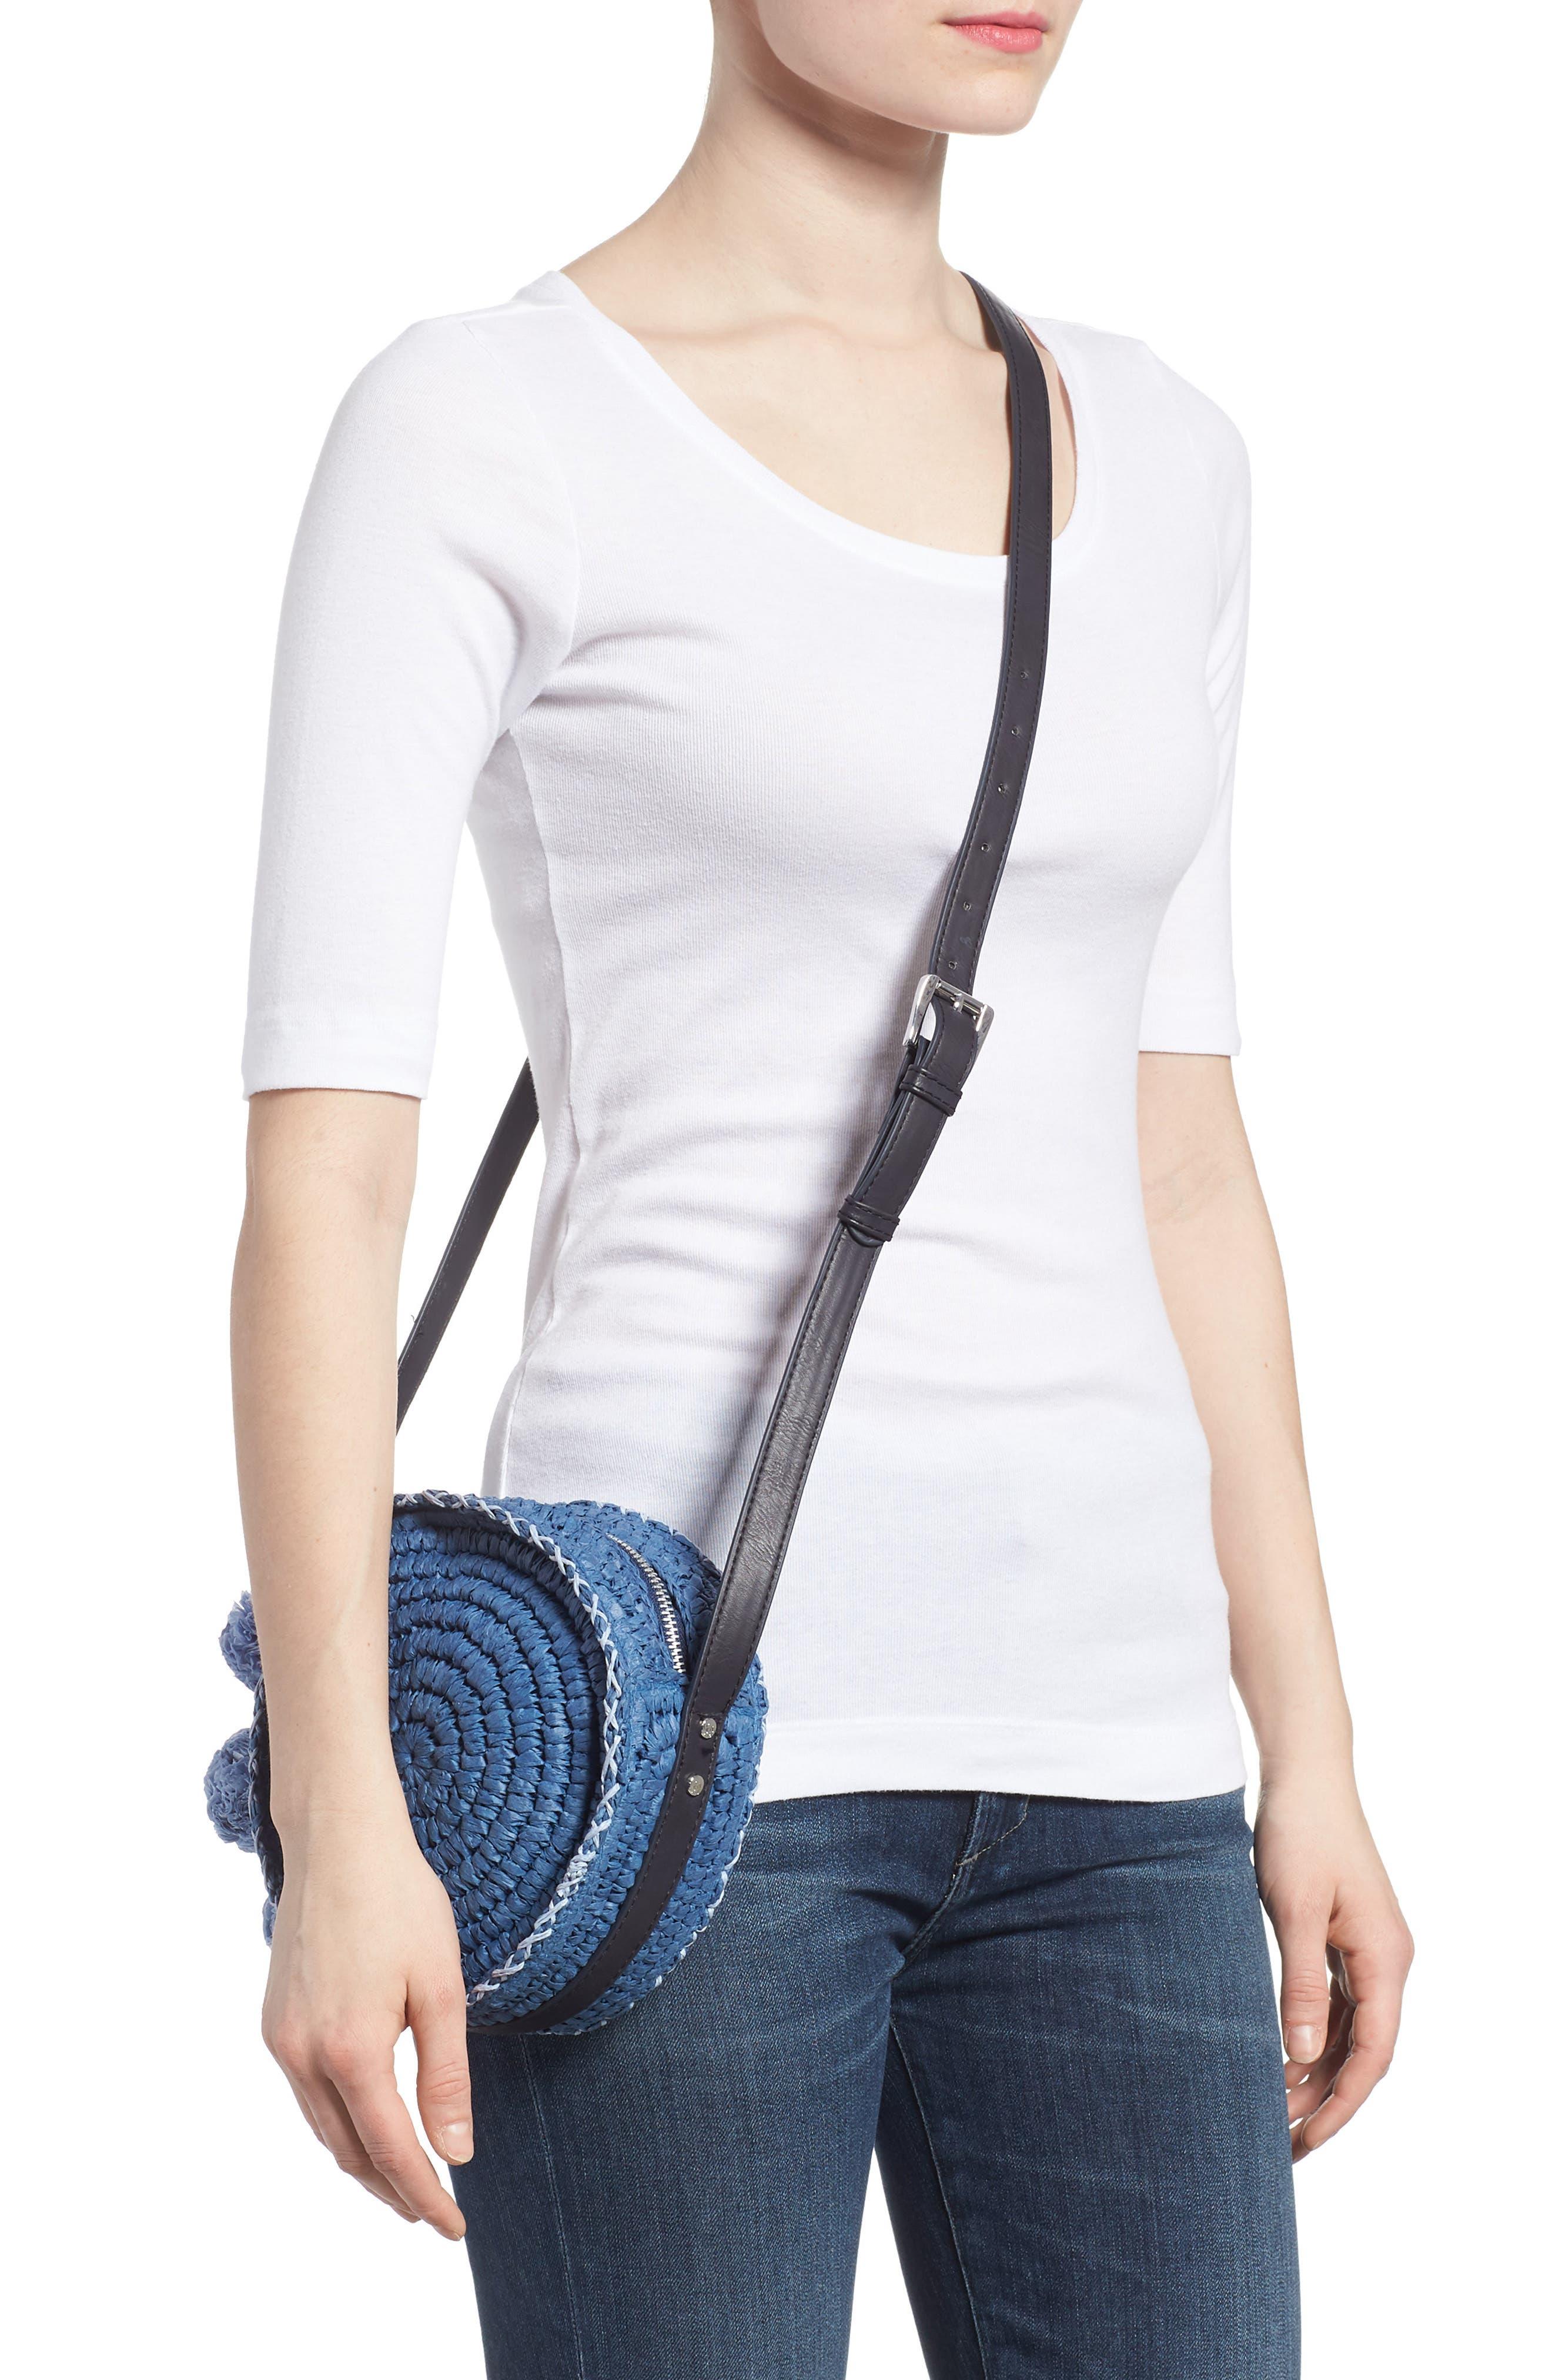 Pirro Woven Straw Crossbody Bag,                             Alternate thumbnail 2, color,                             Navy